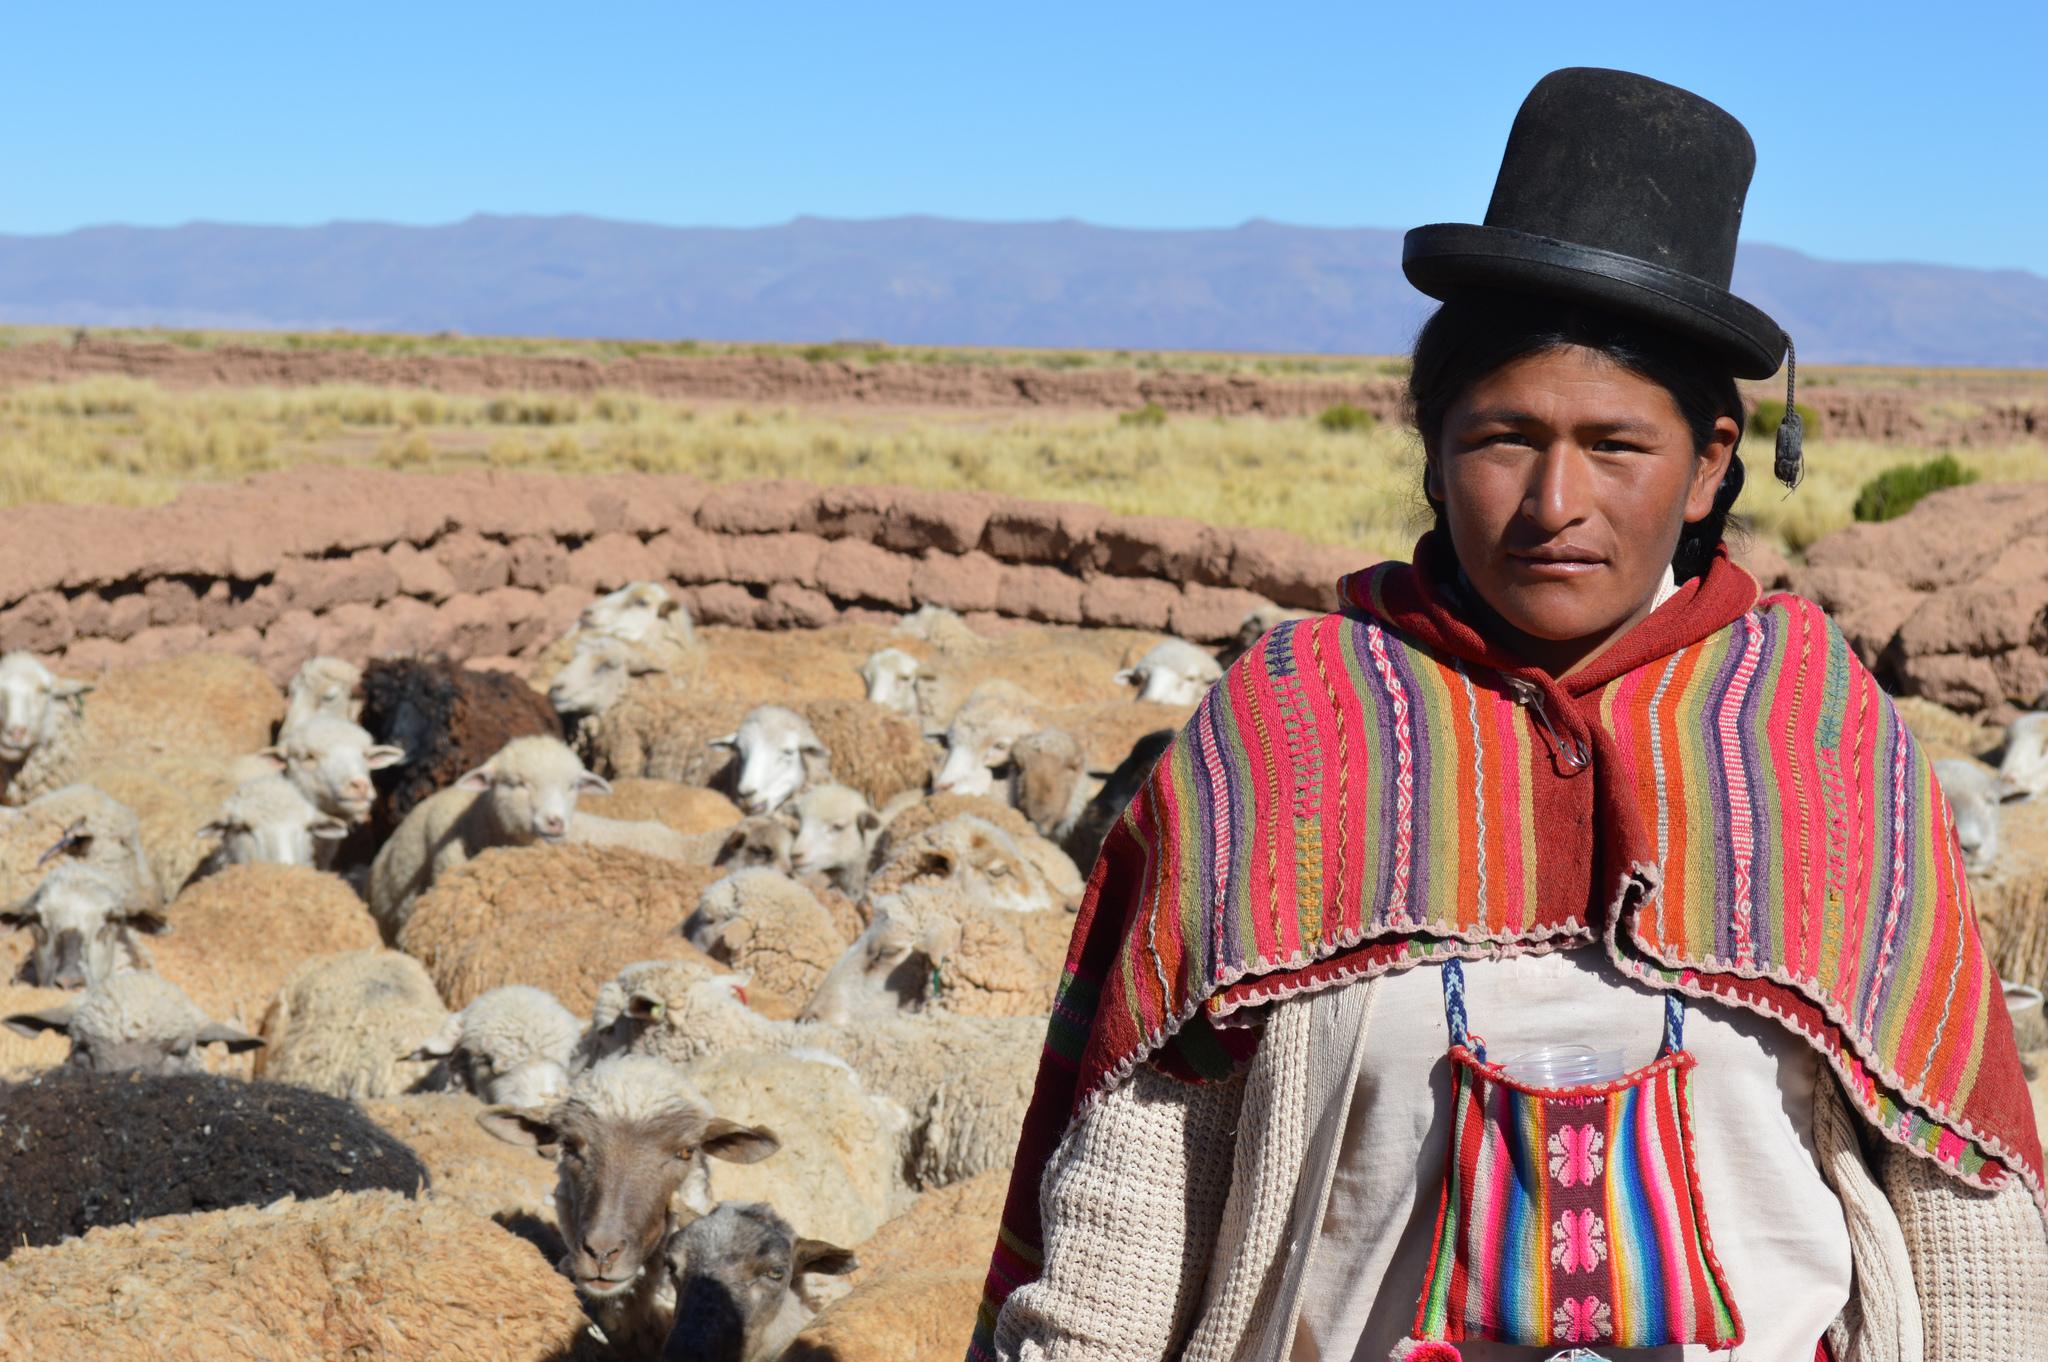 bolivia indigenous woman